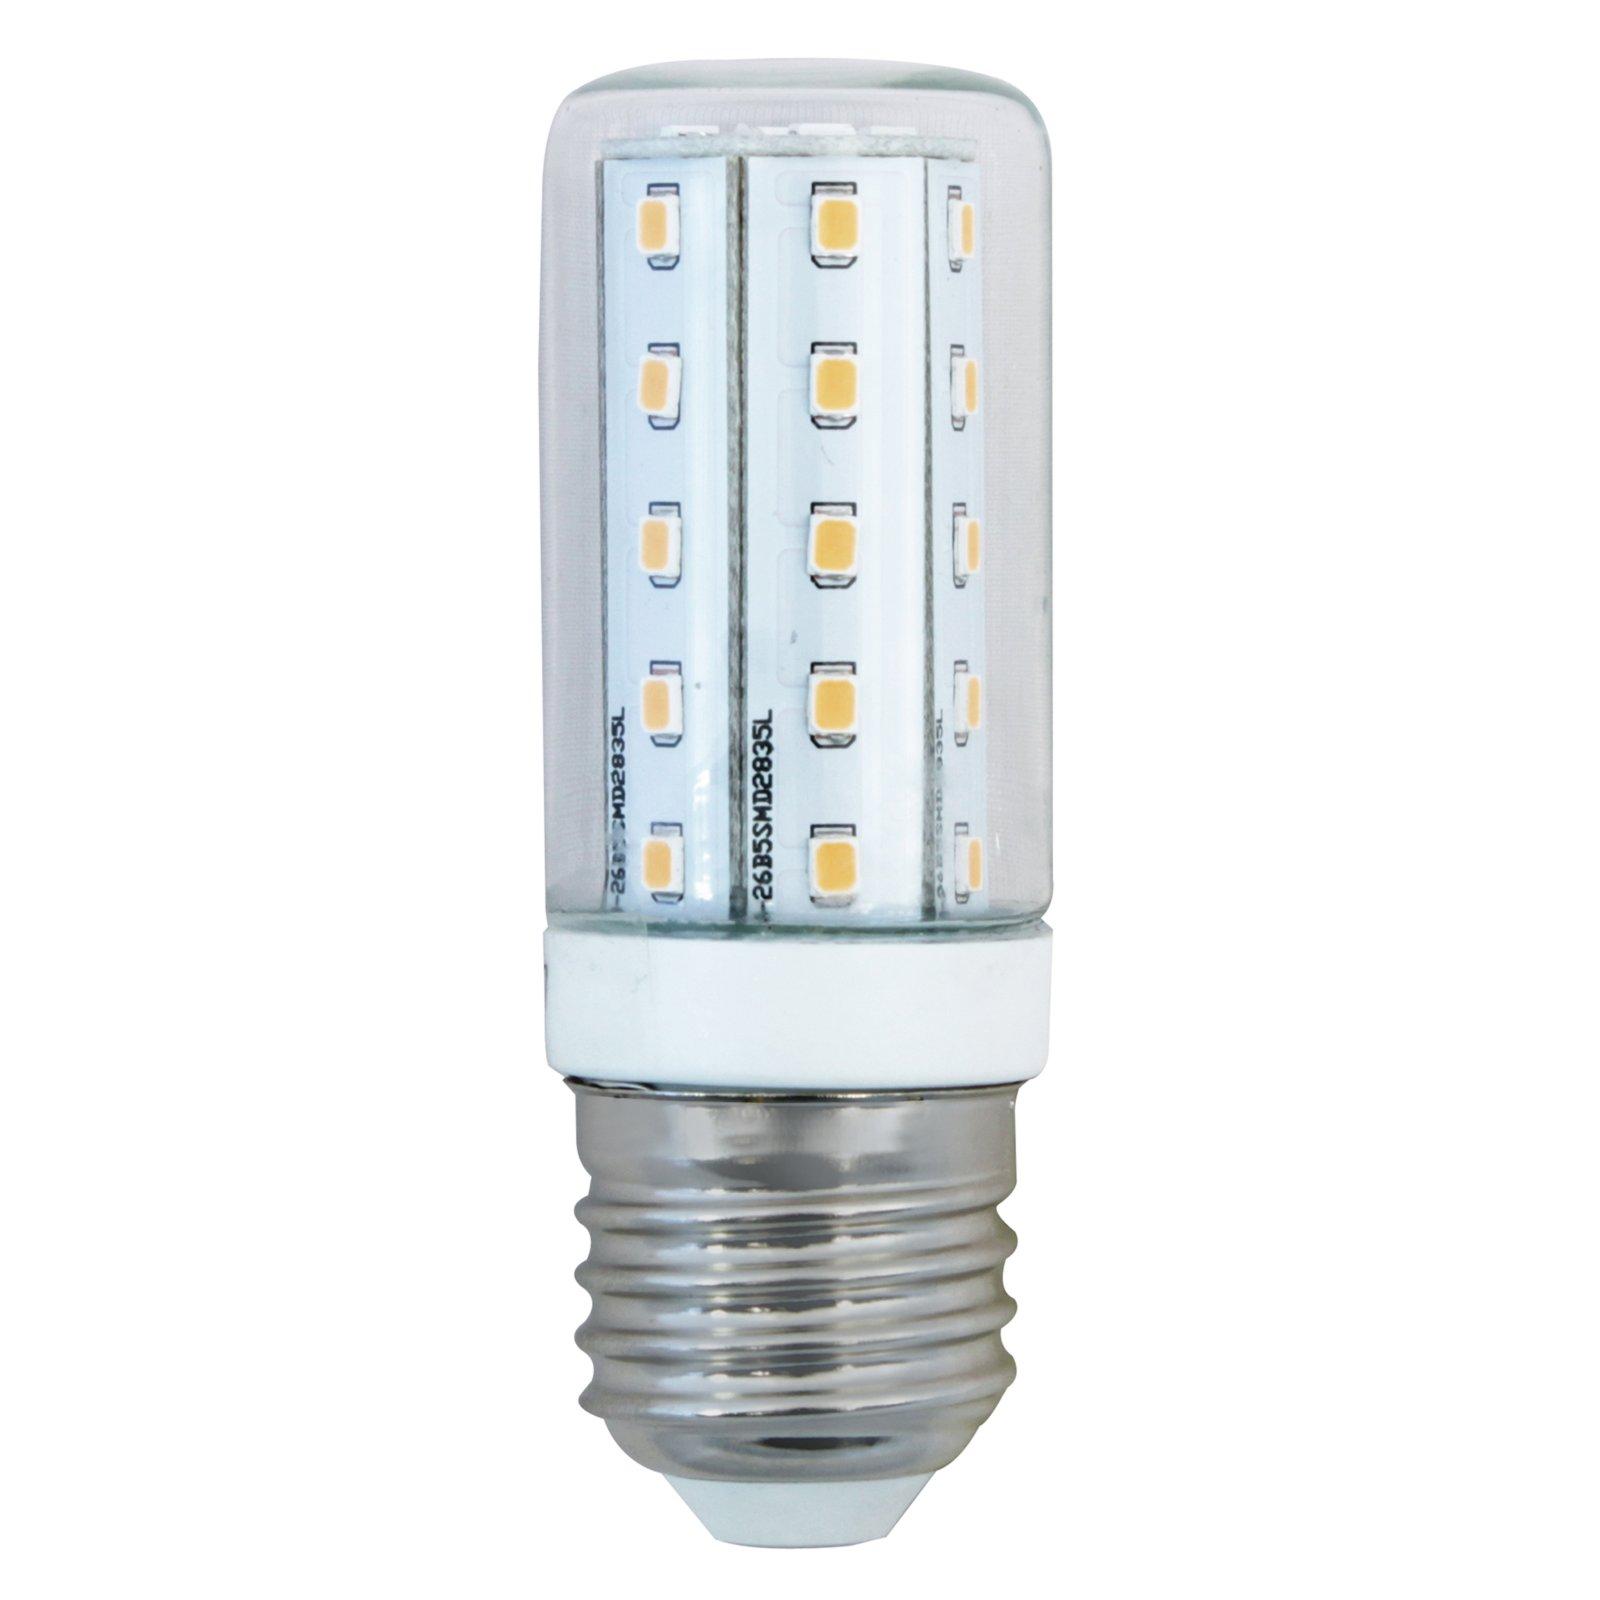 led leuchtmittel slimline lightme t30 e27 4 watt warmwei led leuchtmittel. Black Bedroom Furniture Sets. Home Design Ideas